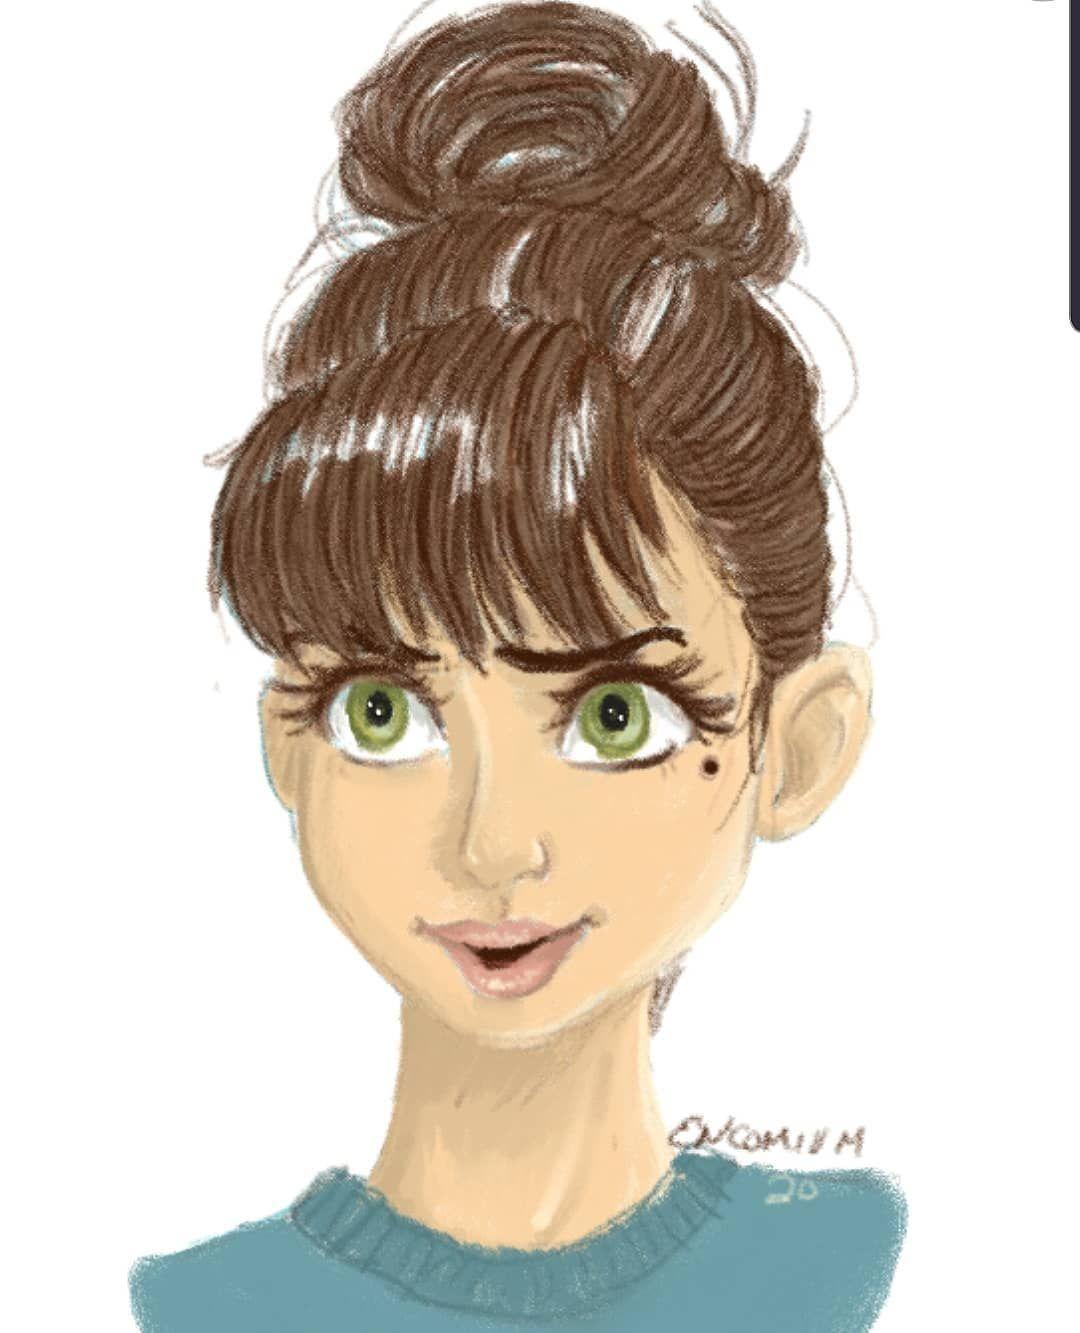 Bangs Bun Got Around To Finally Coloring In This Sketch Encomiumart Bangs Bu In 2020 How To Draw Hair Hazel Eyes Color